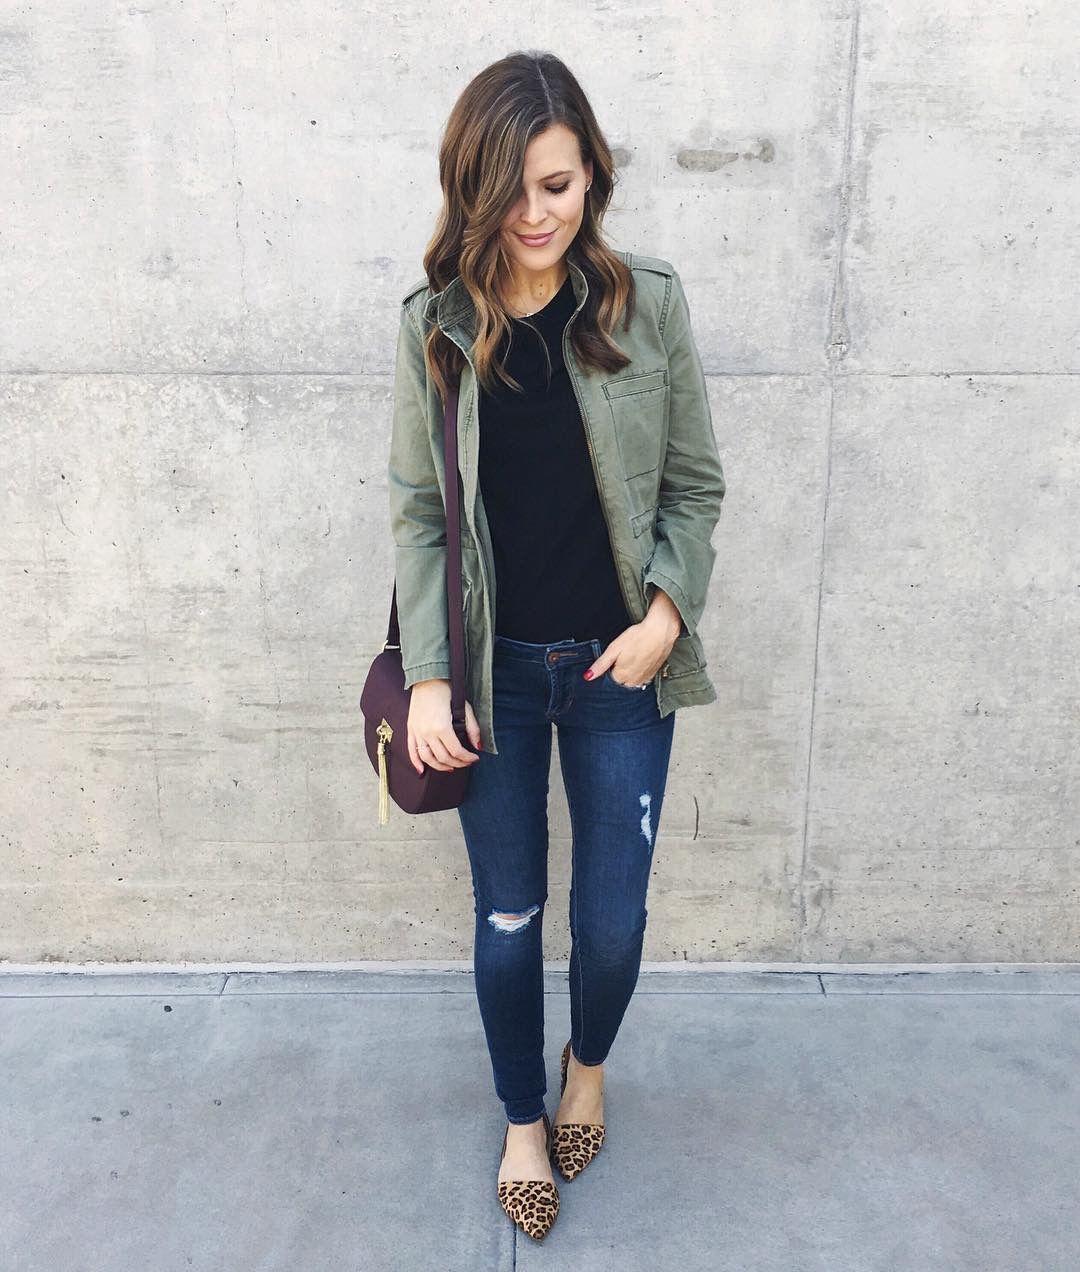 Sophistifunk by Brie Bemis Rearick | Style | Pinterest ...